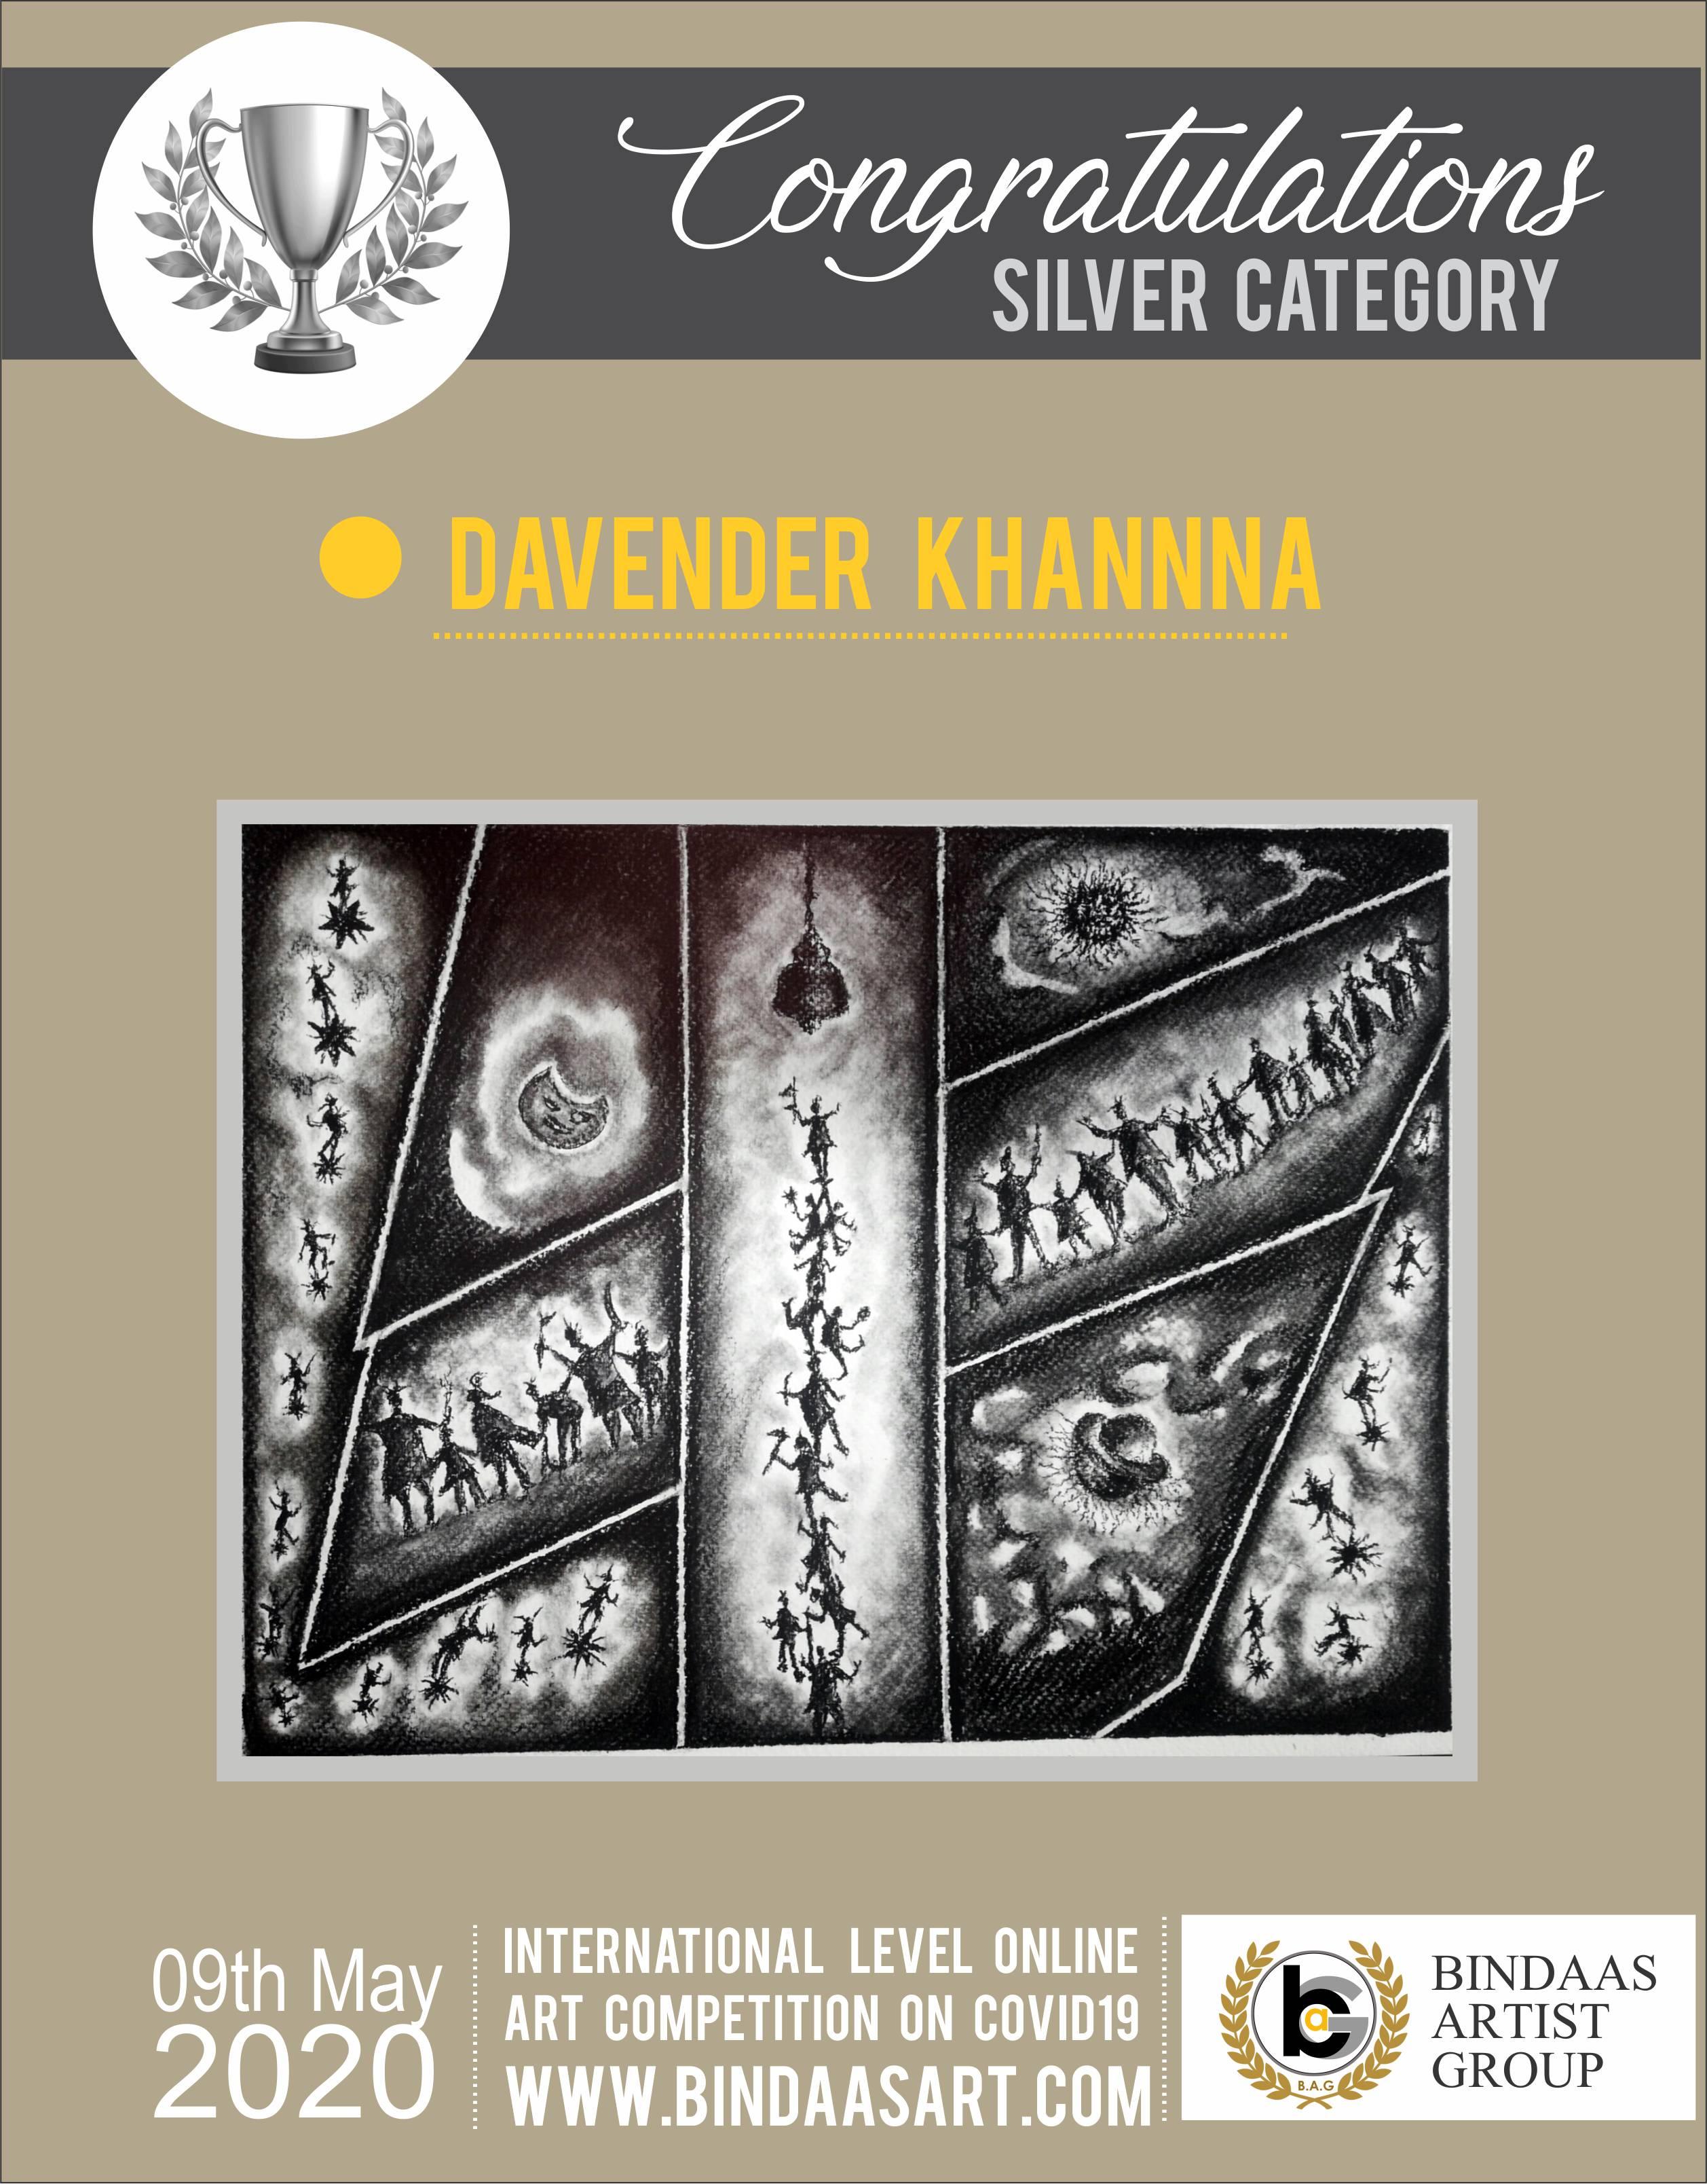 Davender Khannna